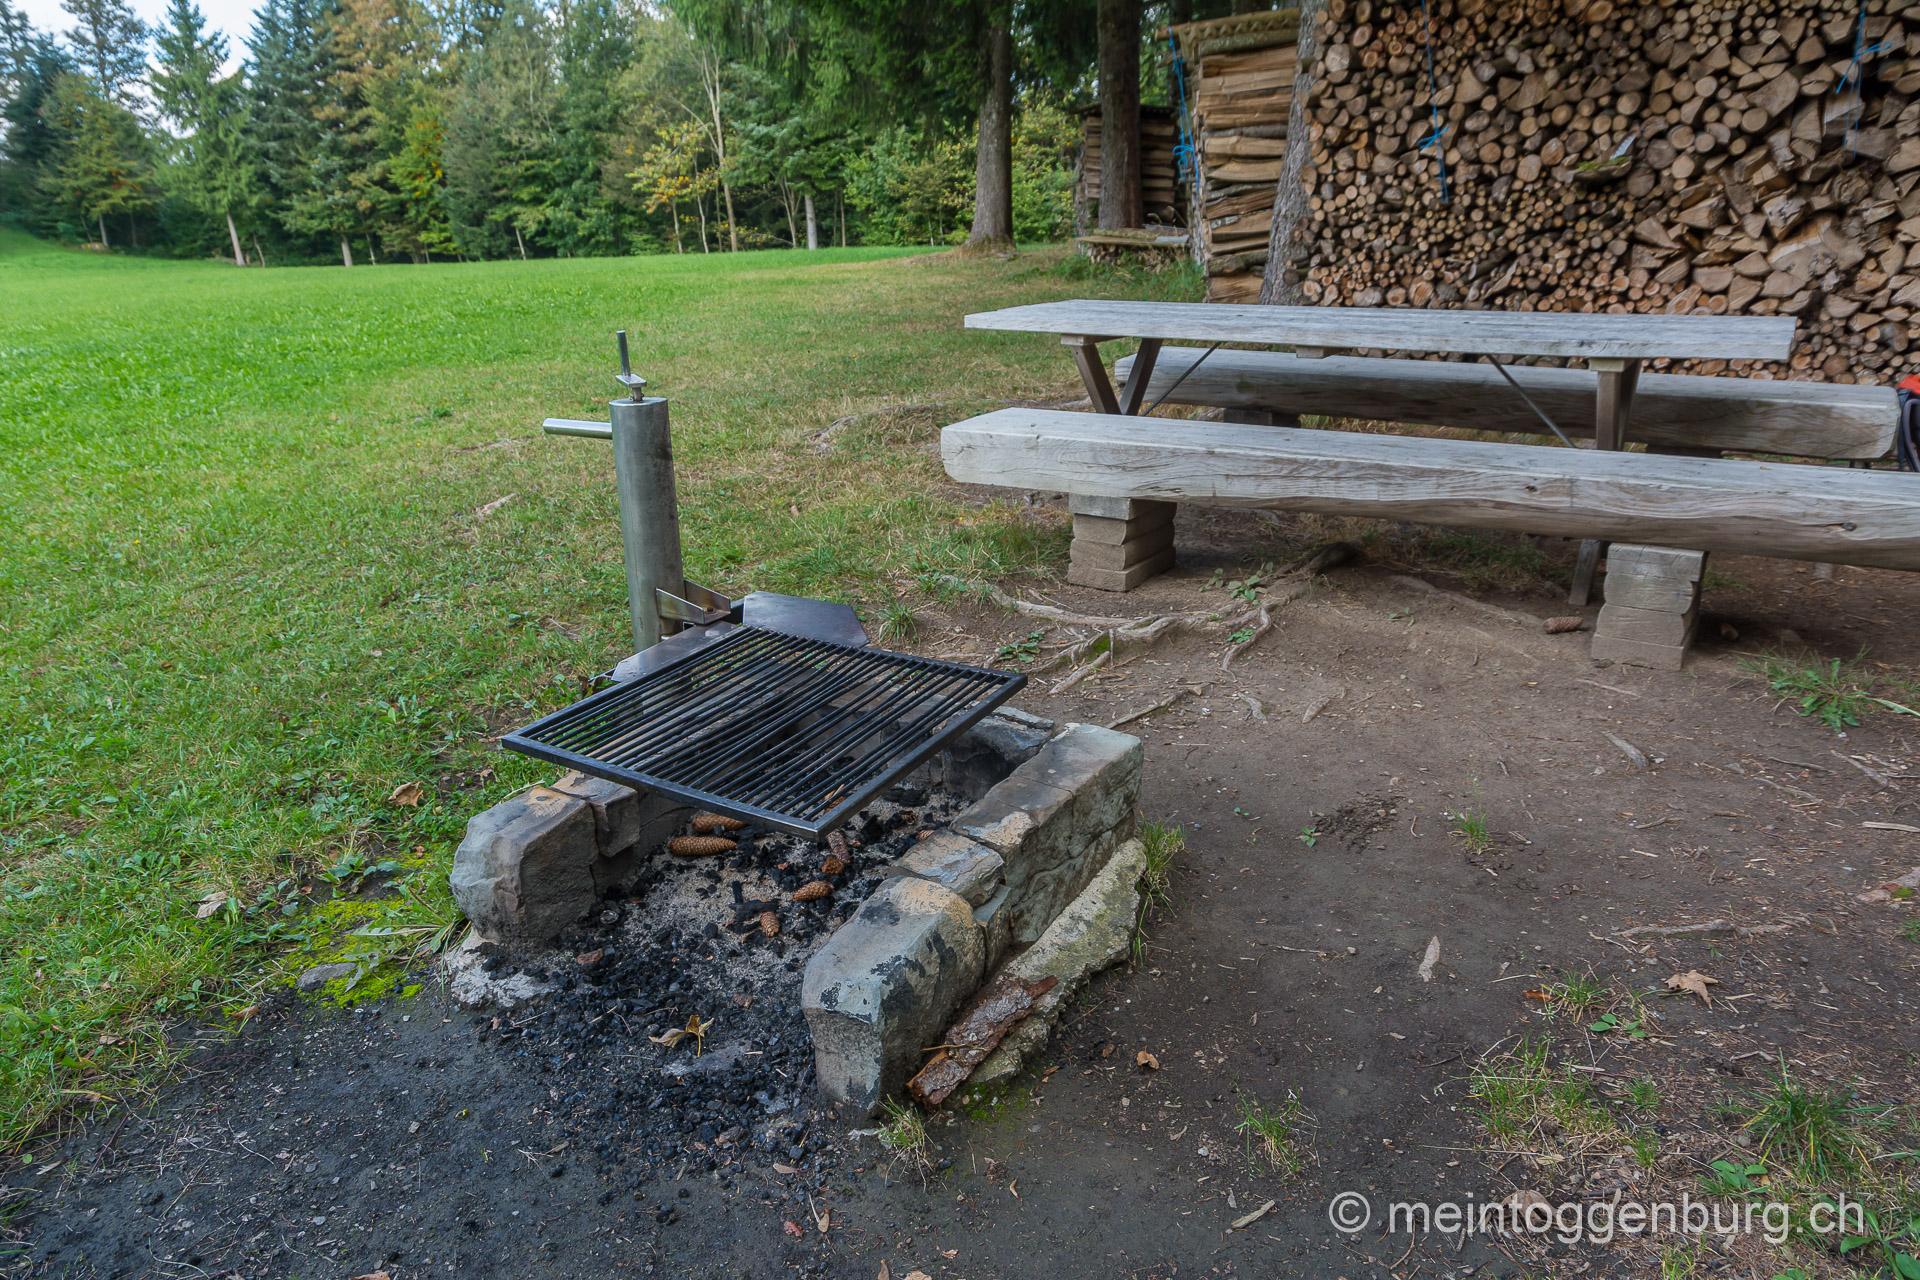 Grillplatz Ackerwis